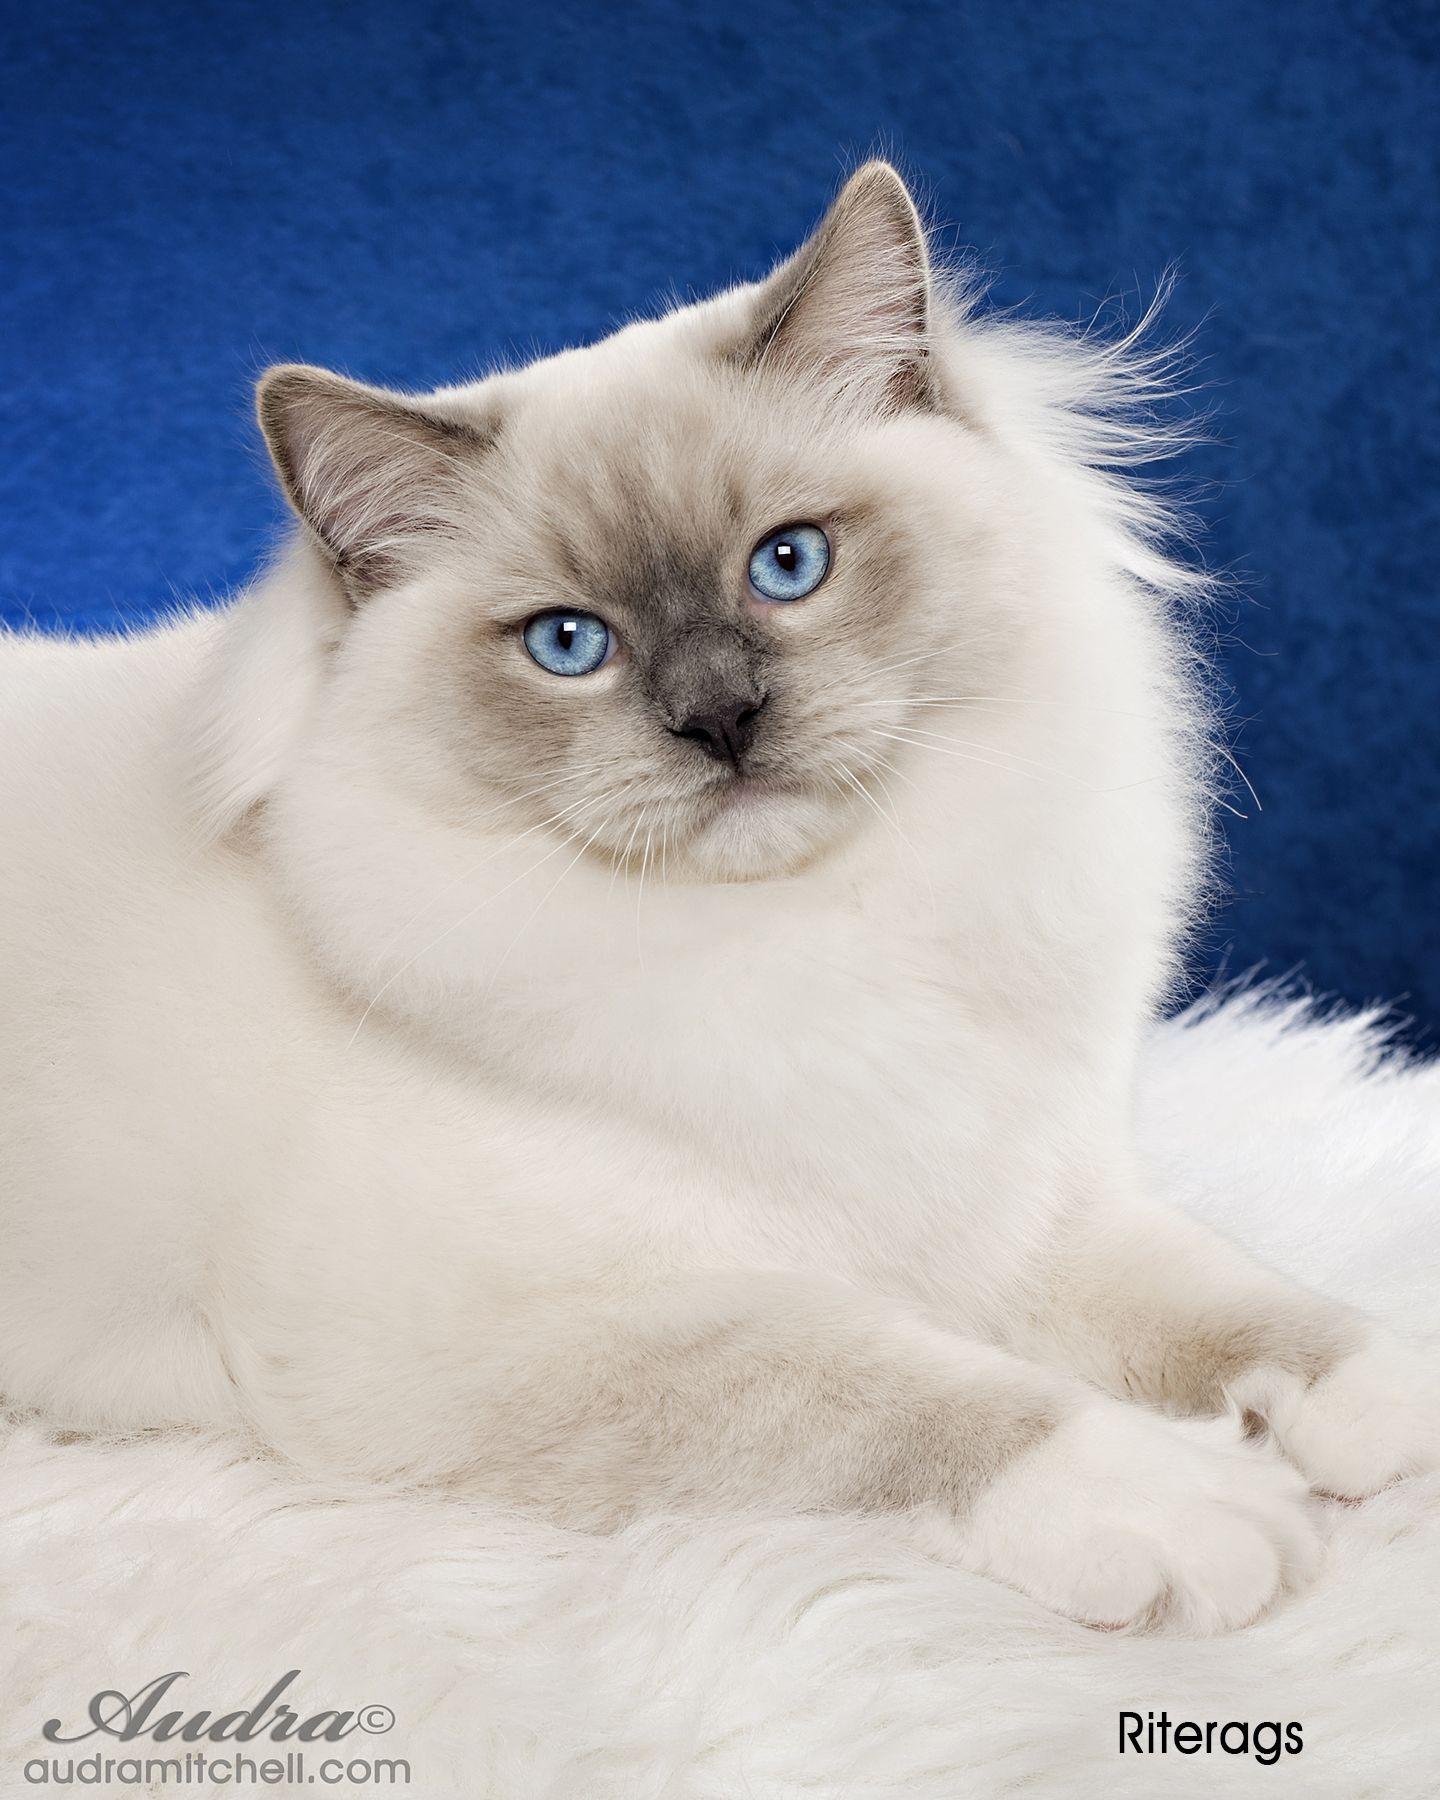 Ragdoll Cat Breeder Ragdoll Cats for Sale Riterag Ragdolls